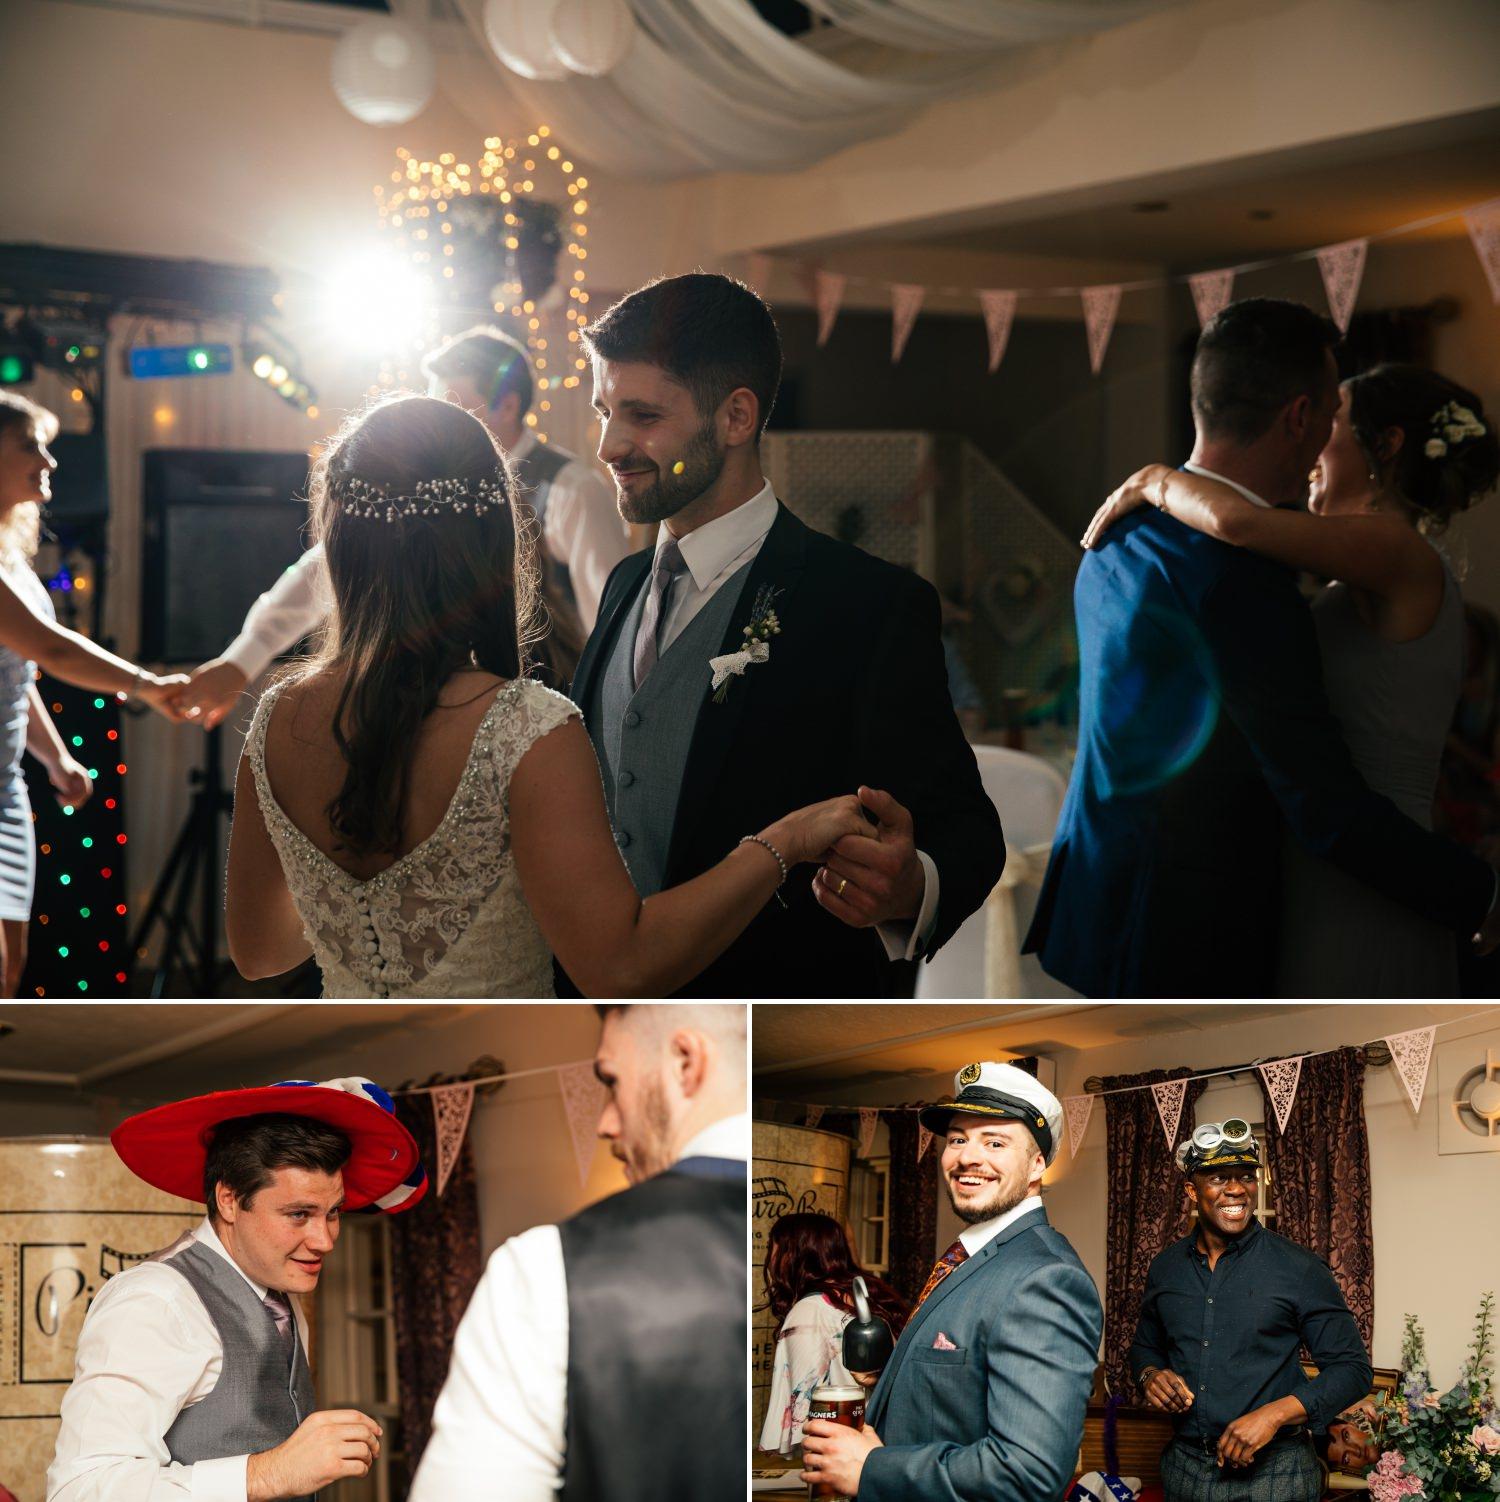 Plas Hafod Wedding Photograph of first dance